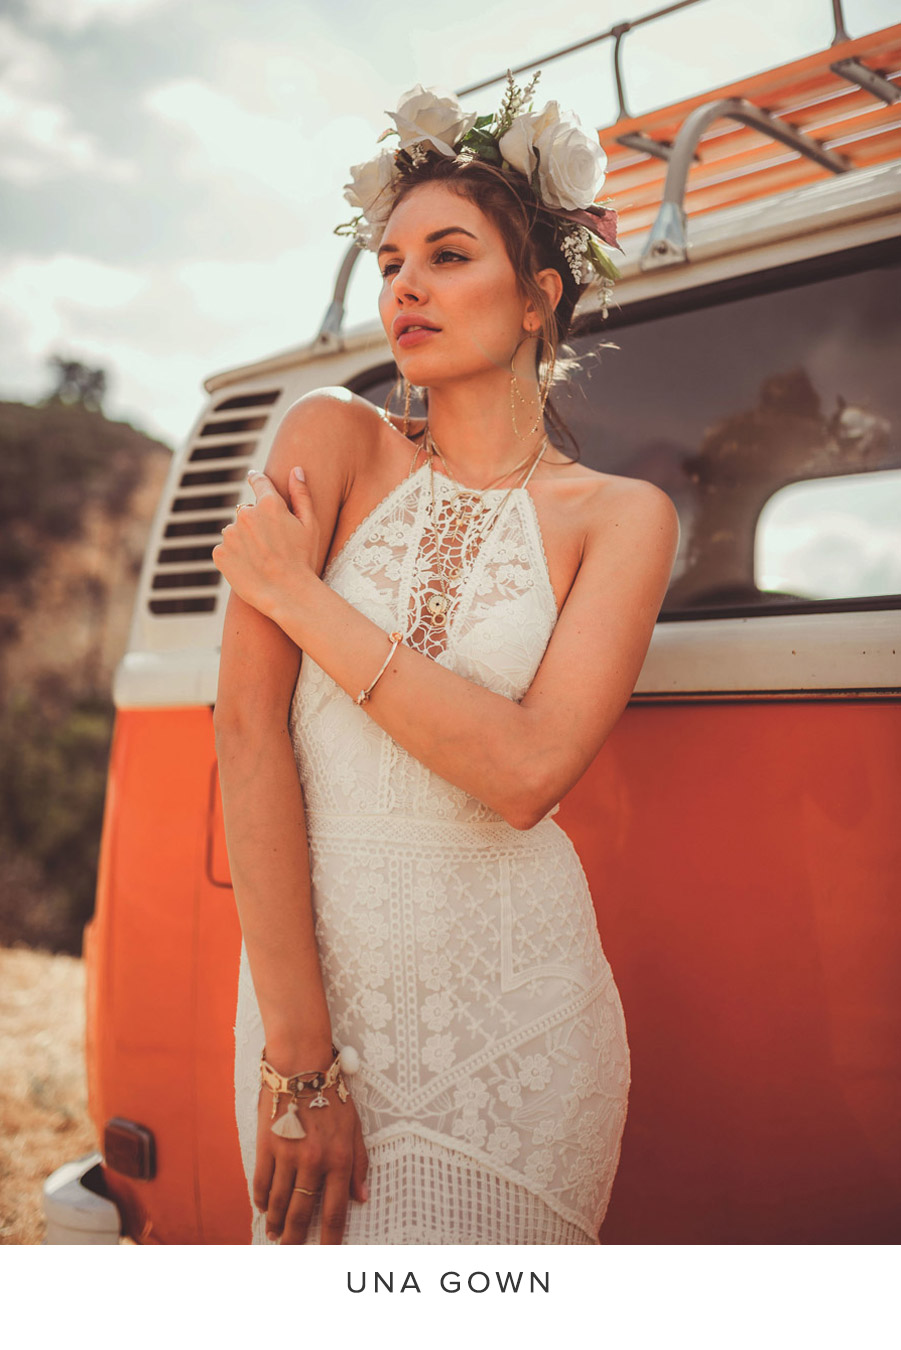 Una Gown